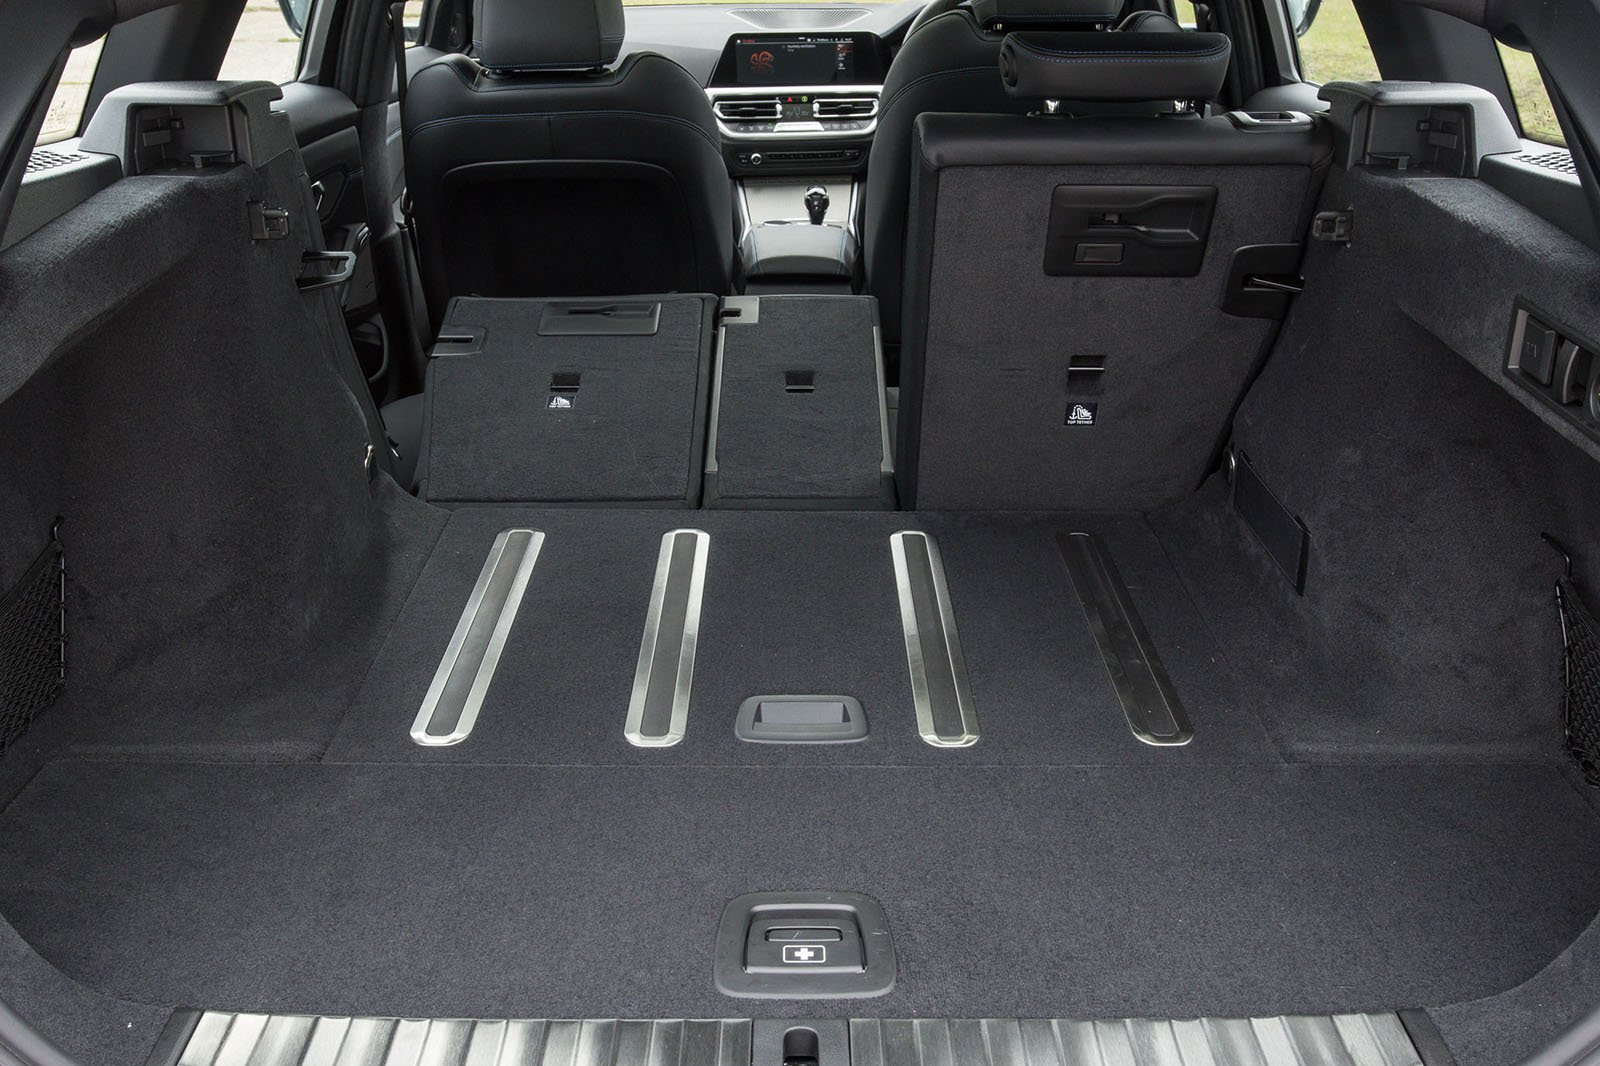 BMW 3 Series Touring 2019 RHD boot open